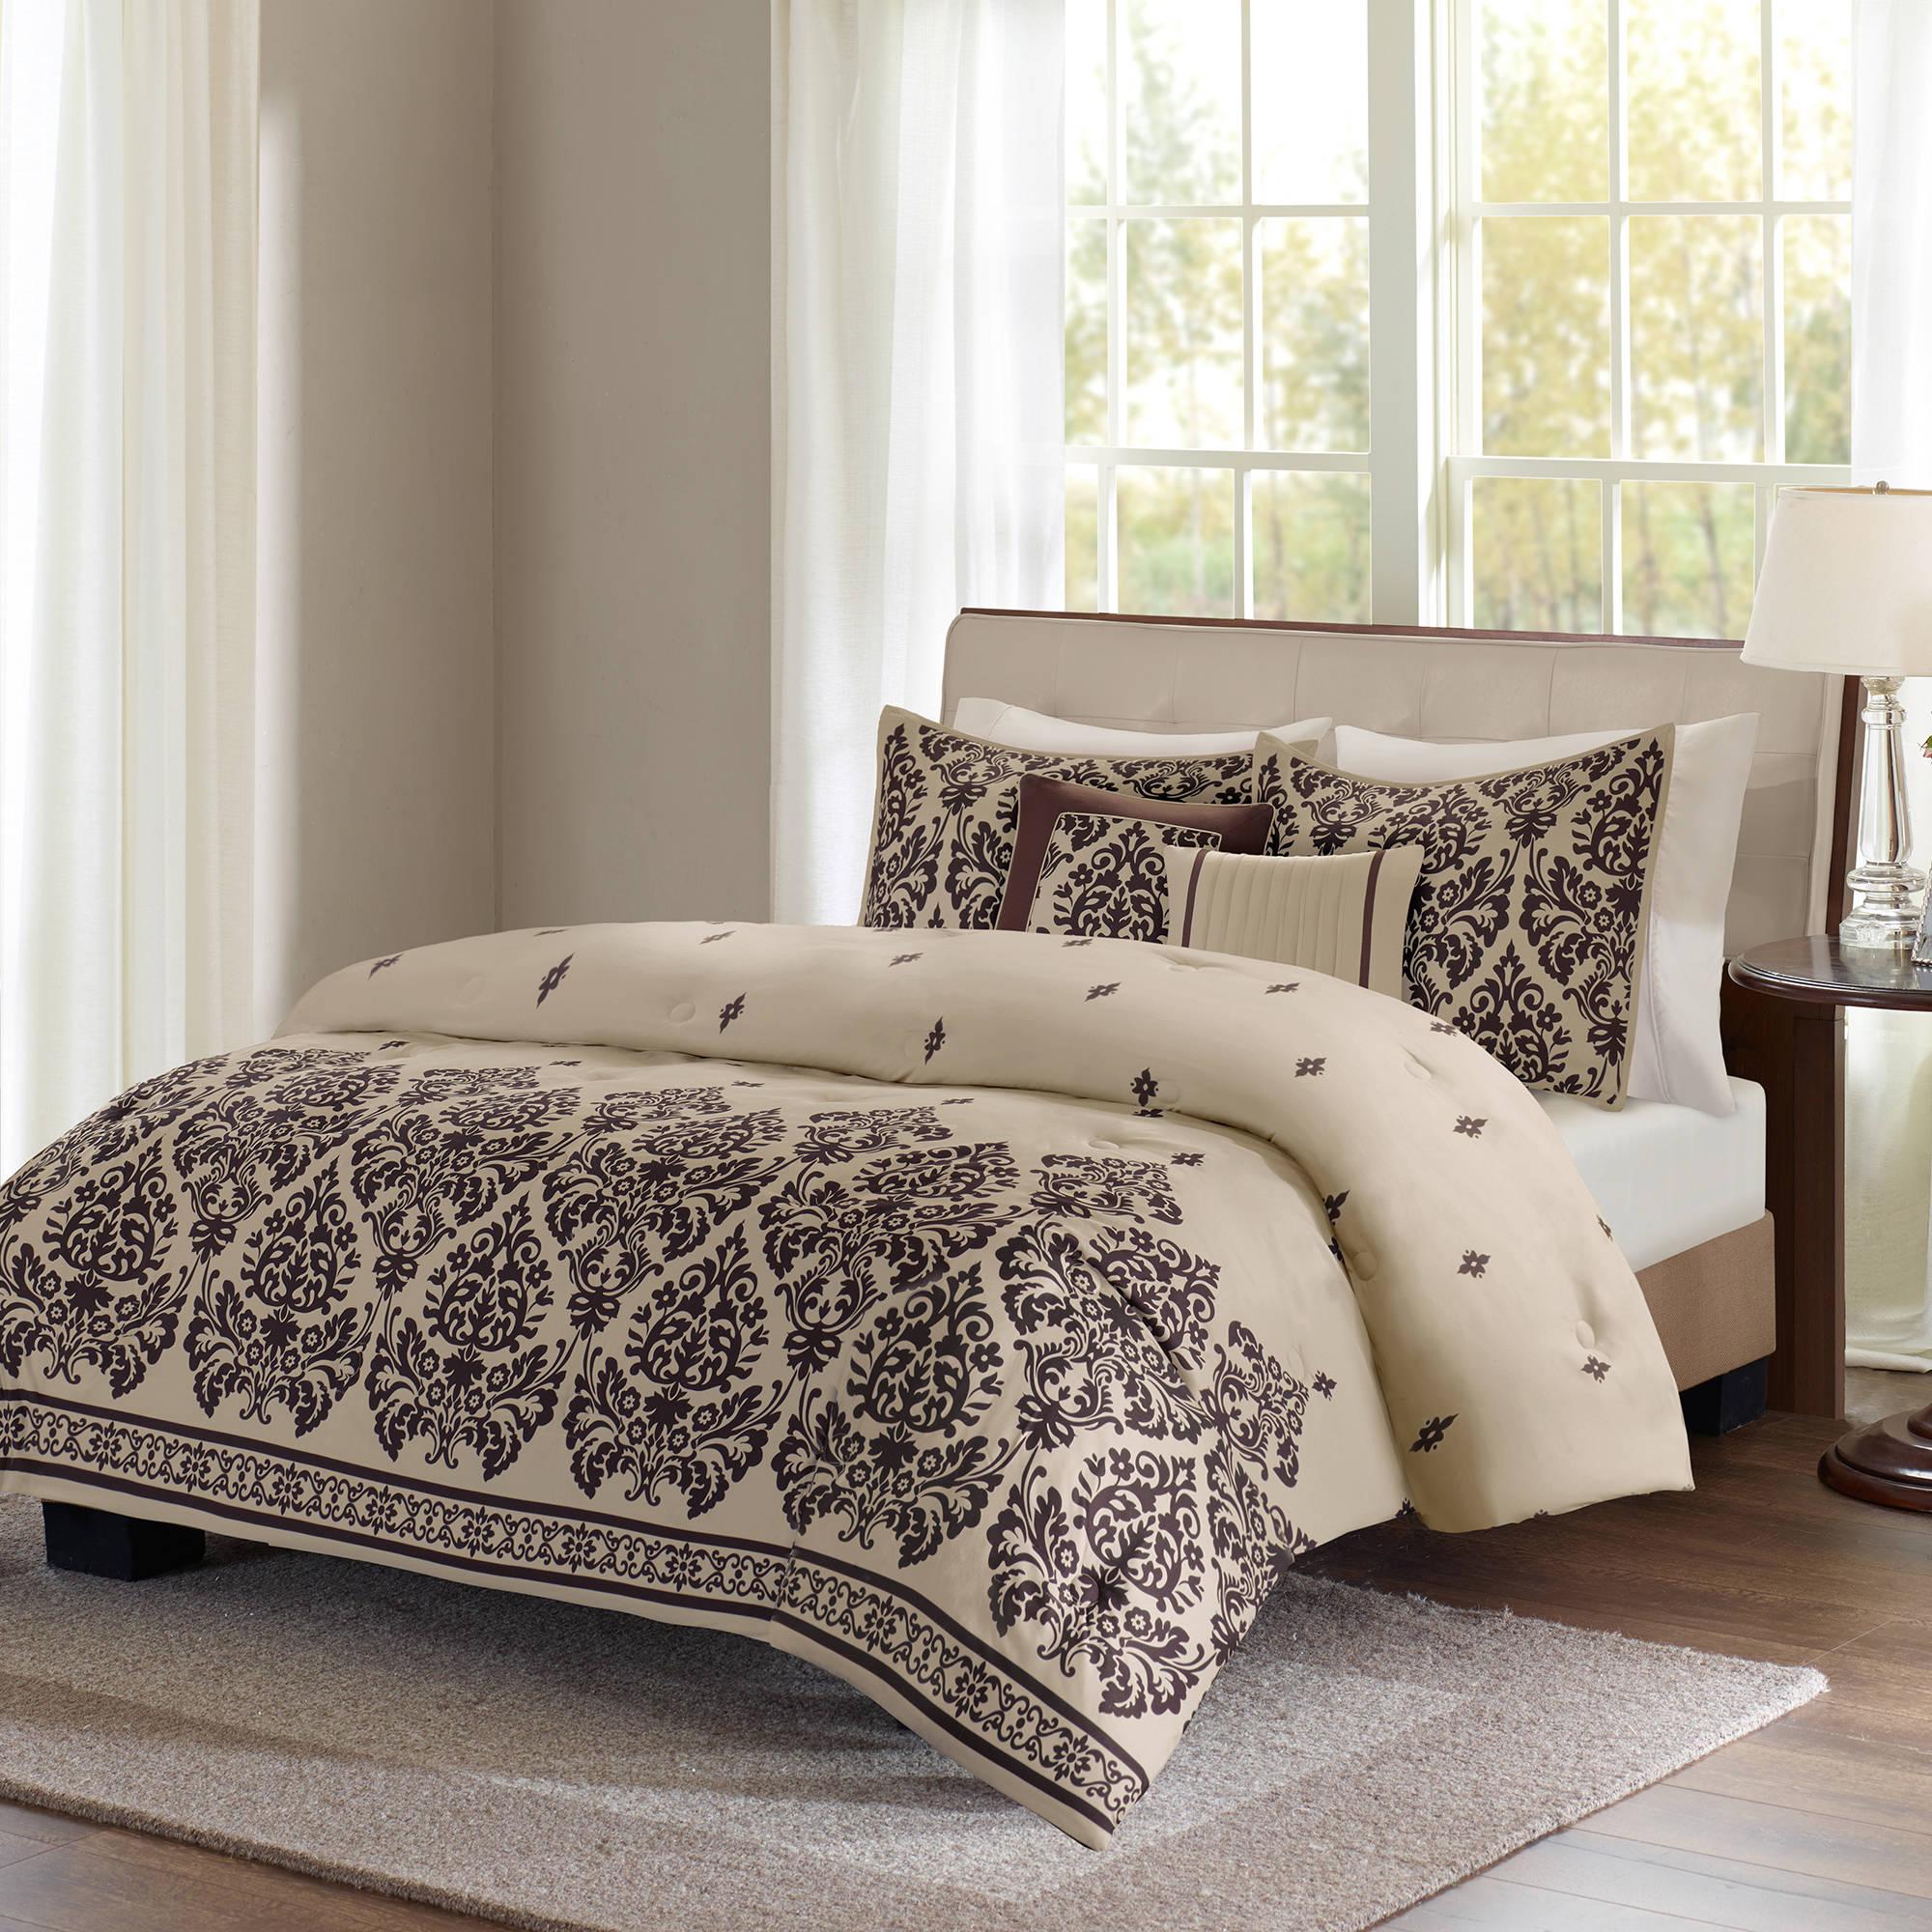 Better Homes and Gardens 5pc Damask Comforter Set